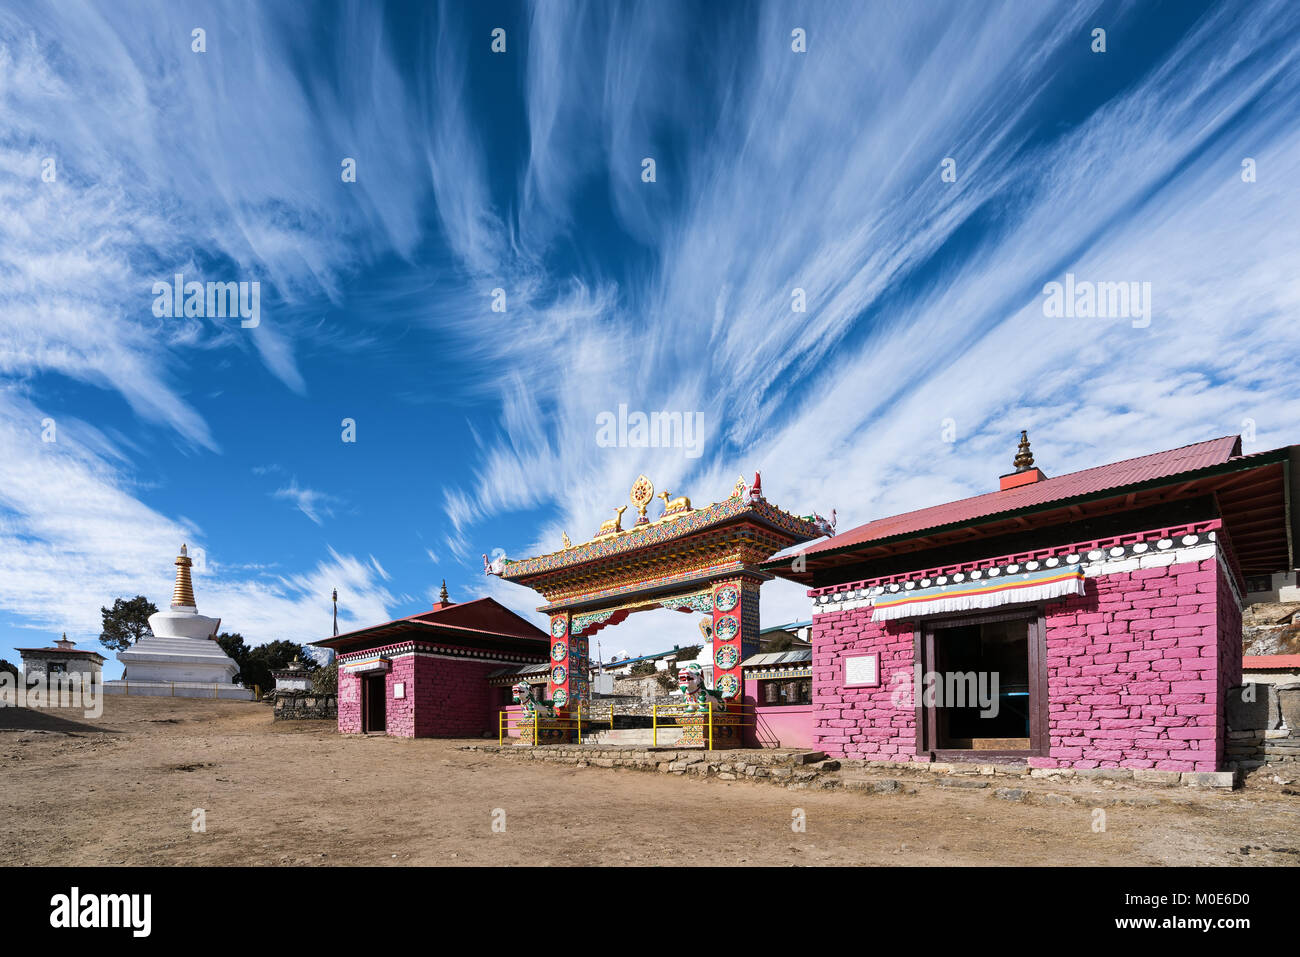 Tengboche Monastery on the Everest base camp and three passes trek, Nepal - Stock Image